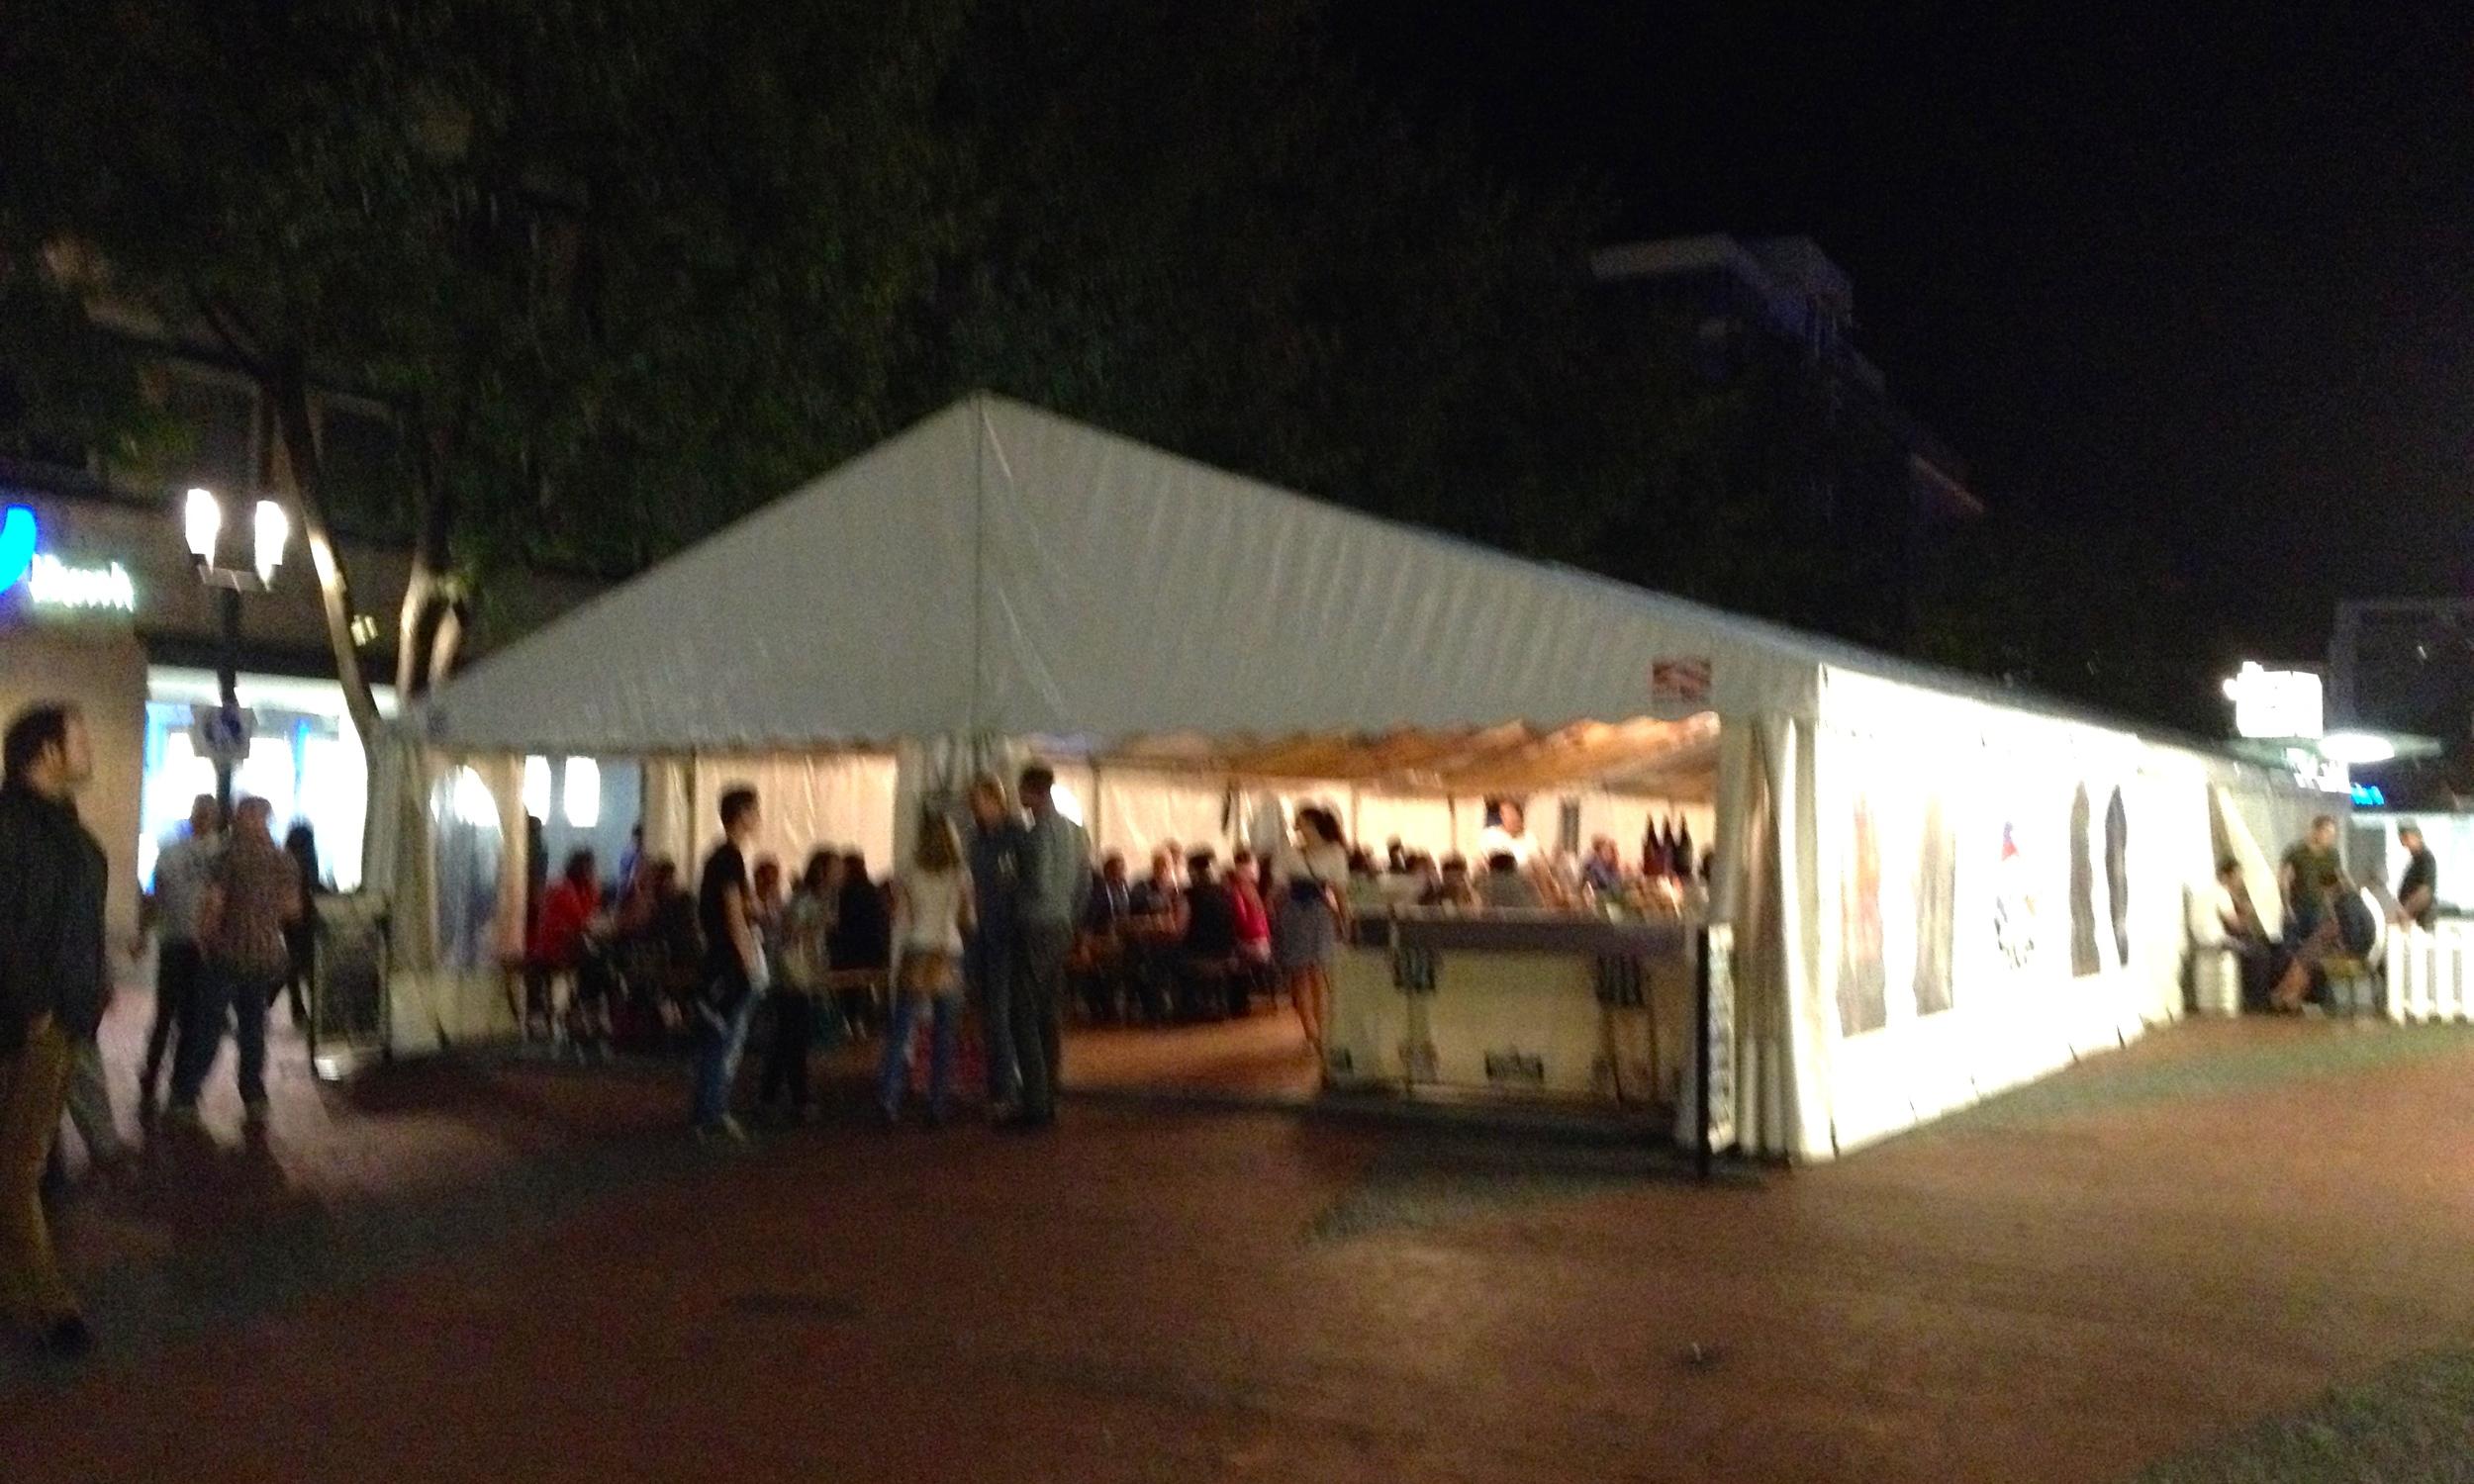 The Czech Beer Festival tent in Kronprinzplatz